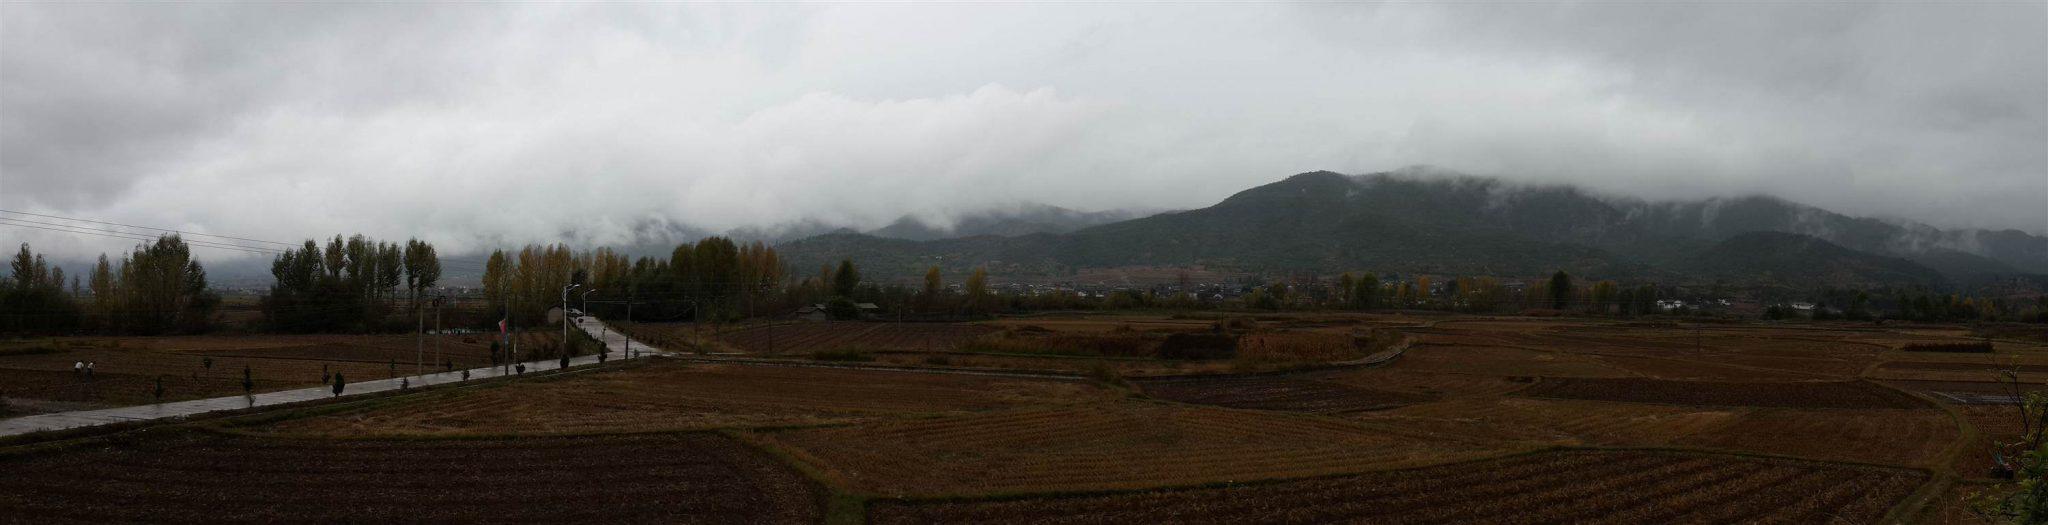 Himalayan monsoon seasons affect Shaxi weather